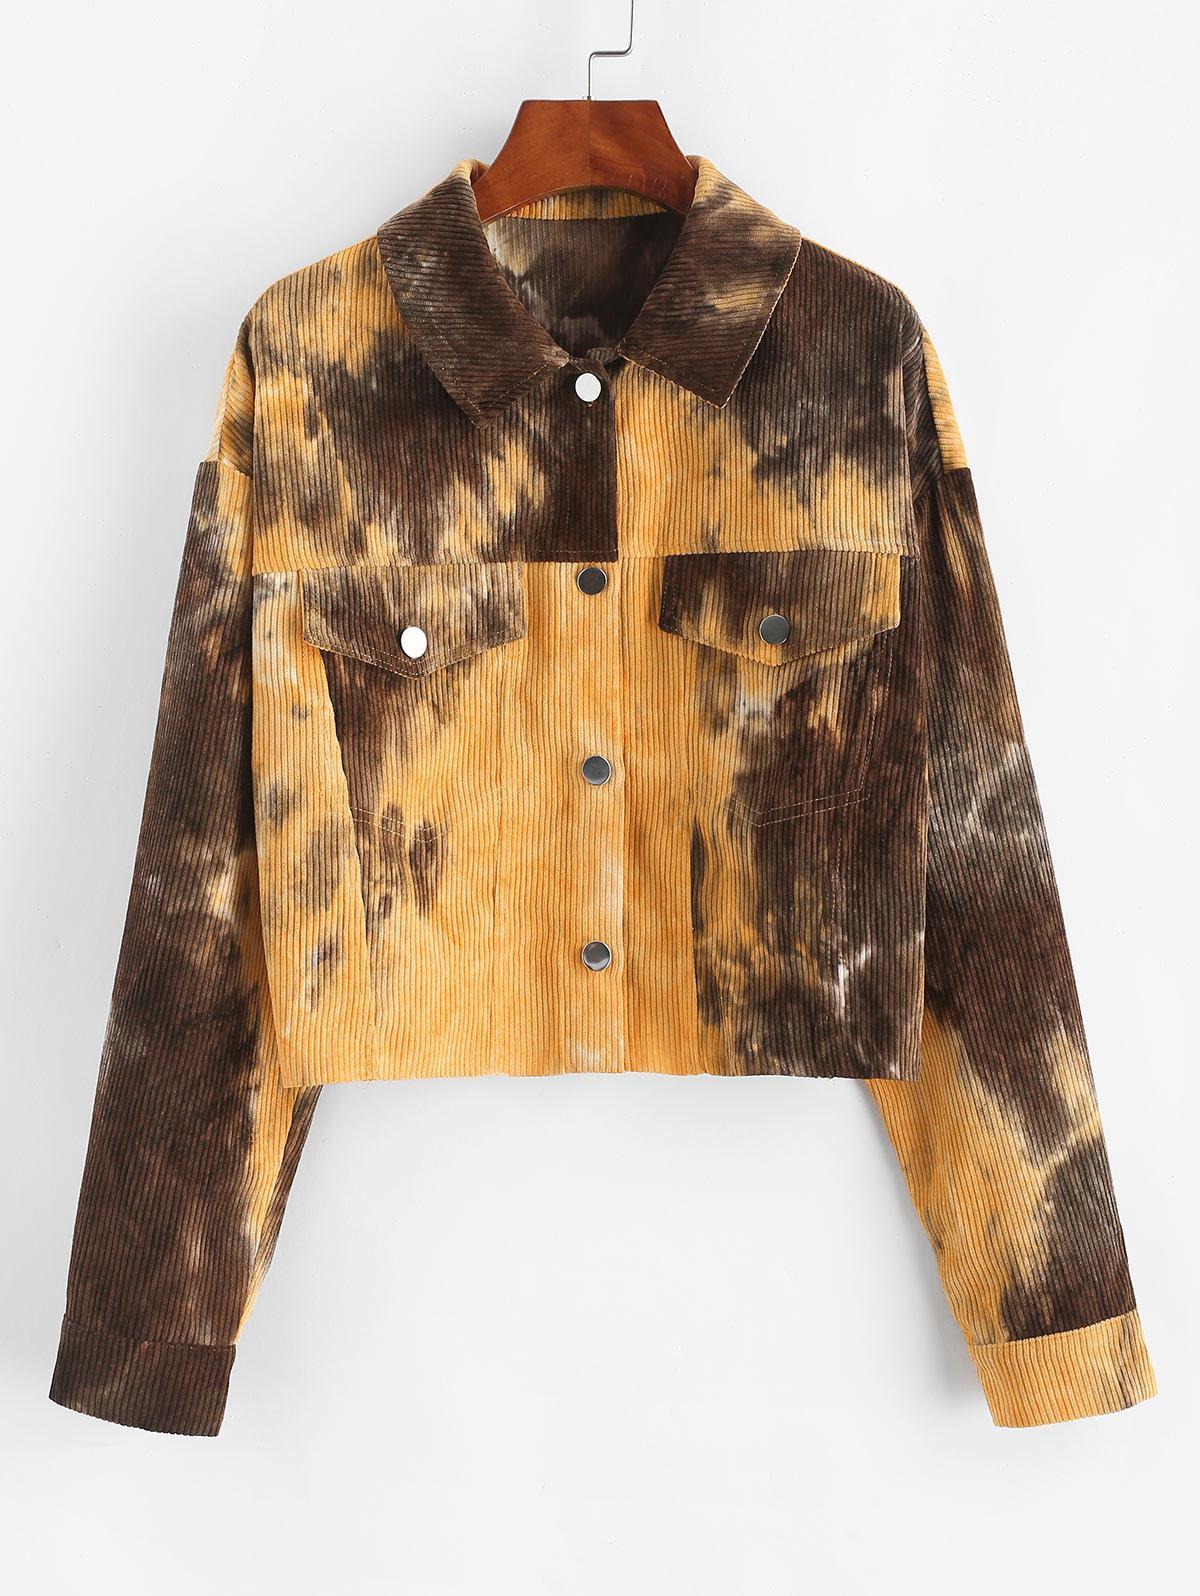 ZAFUL Corduroy Tie Dye Jacket